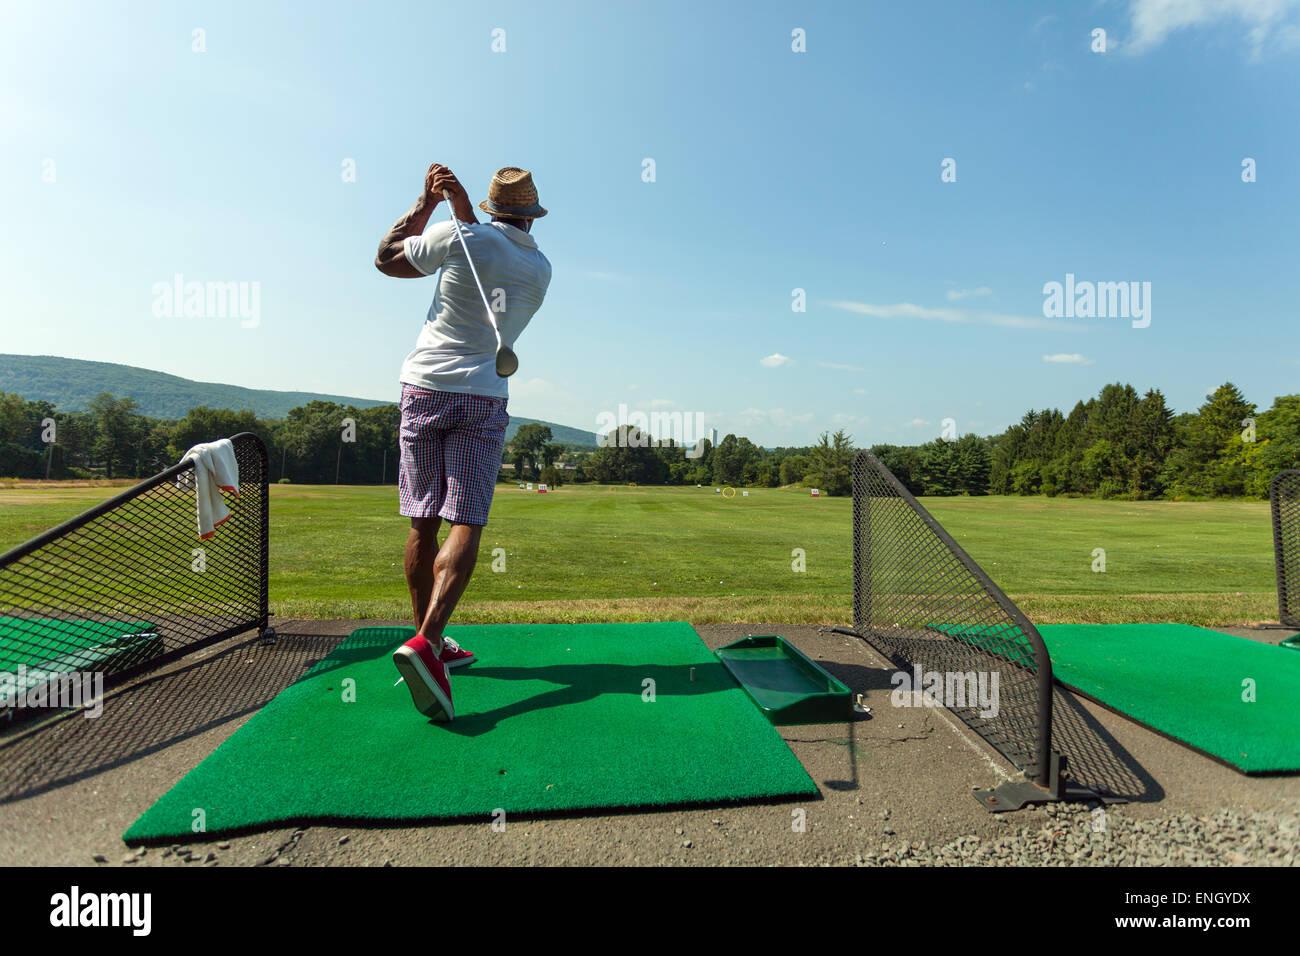 Driving Range Golf Swing - Stock Image